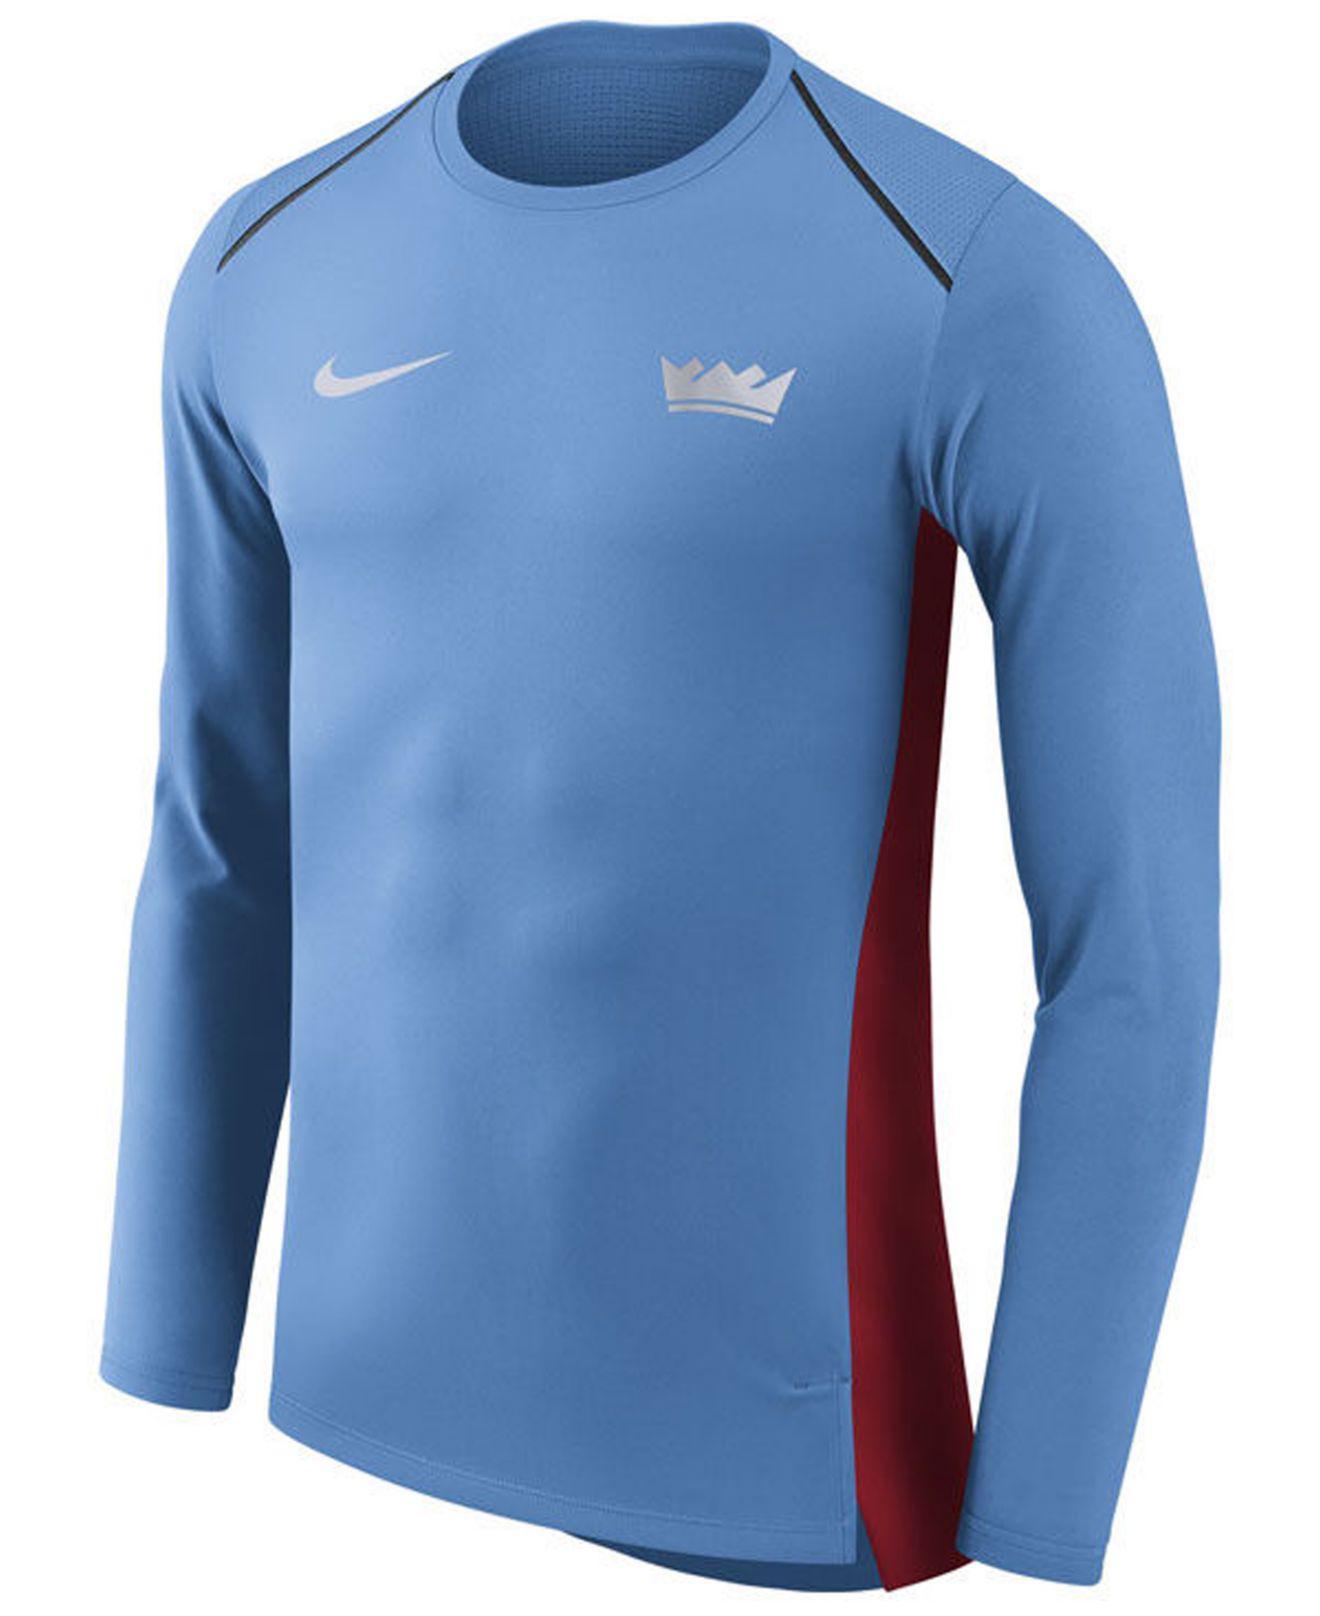 outlet store 715ee d9a43 sacramento kings jersey light blue